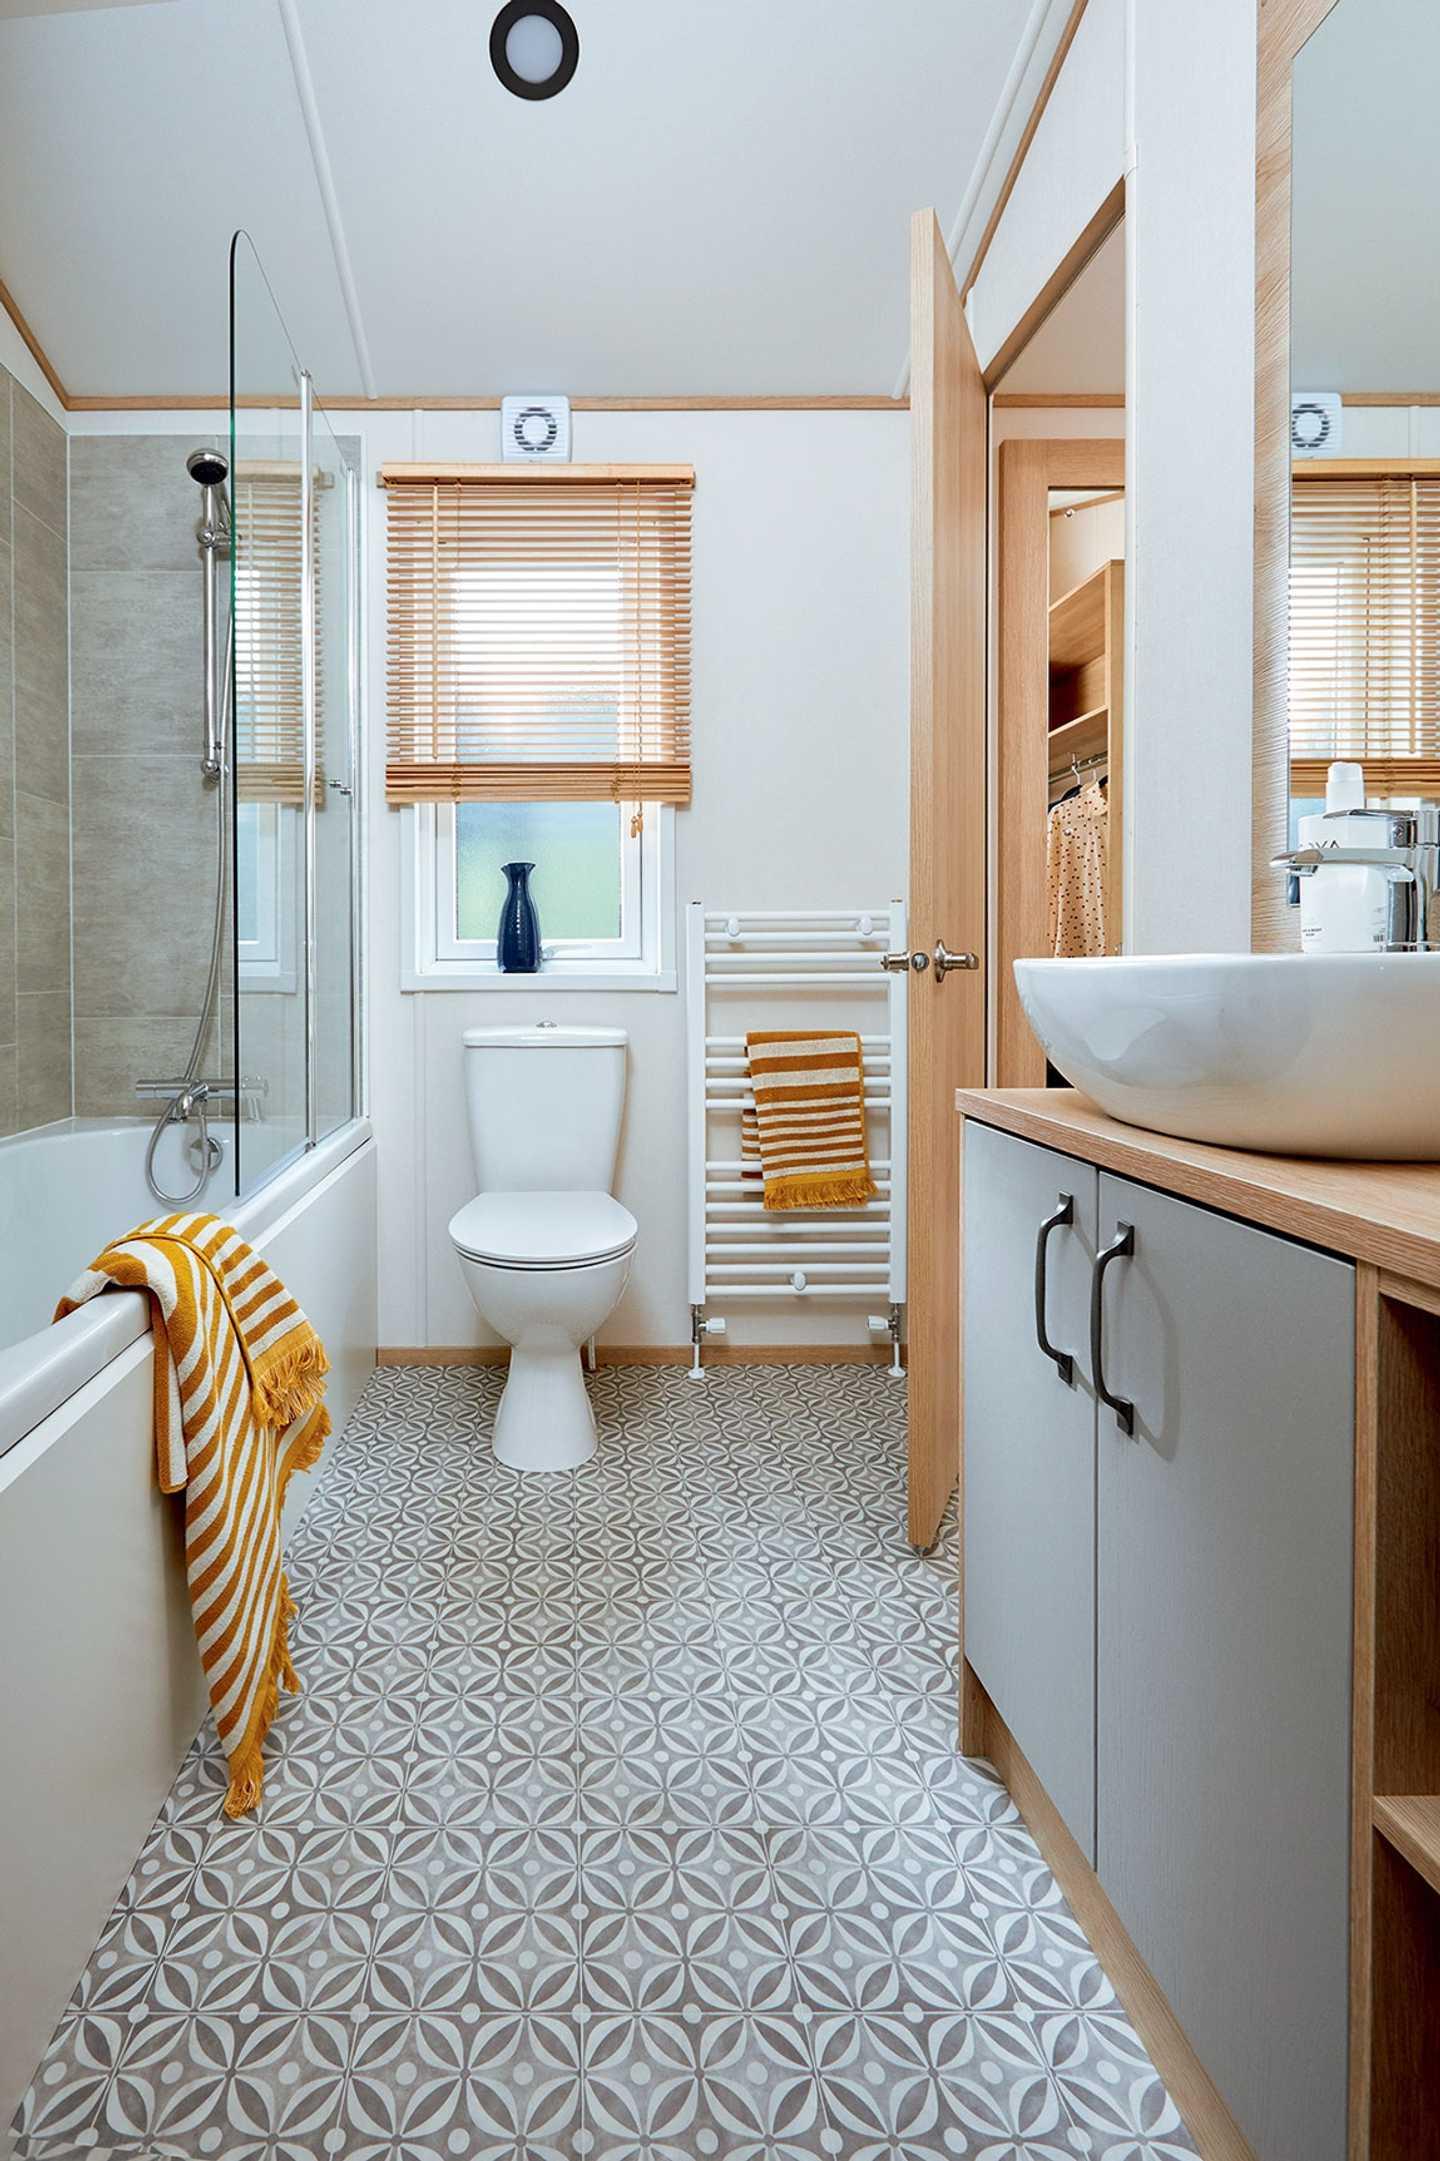 Luxury Lodge twin bathroom at Elterwater